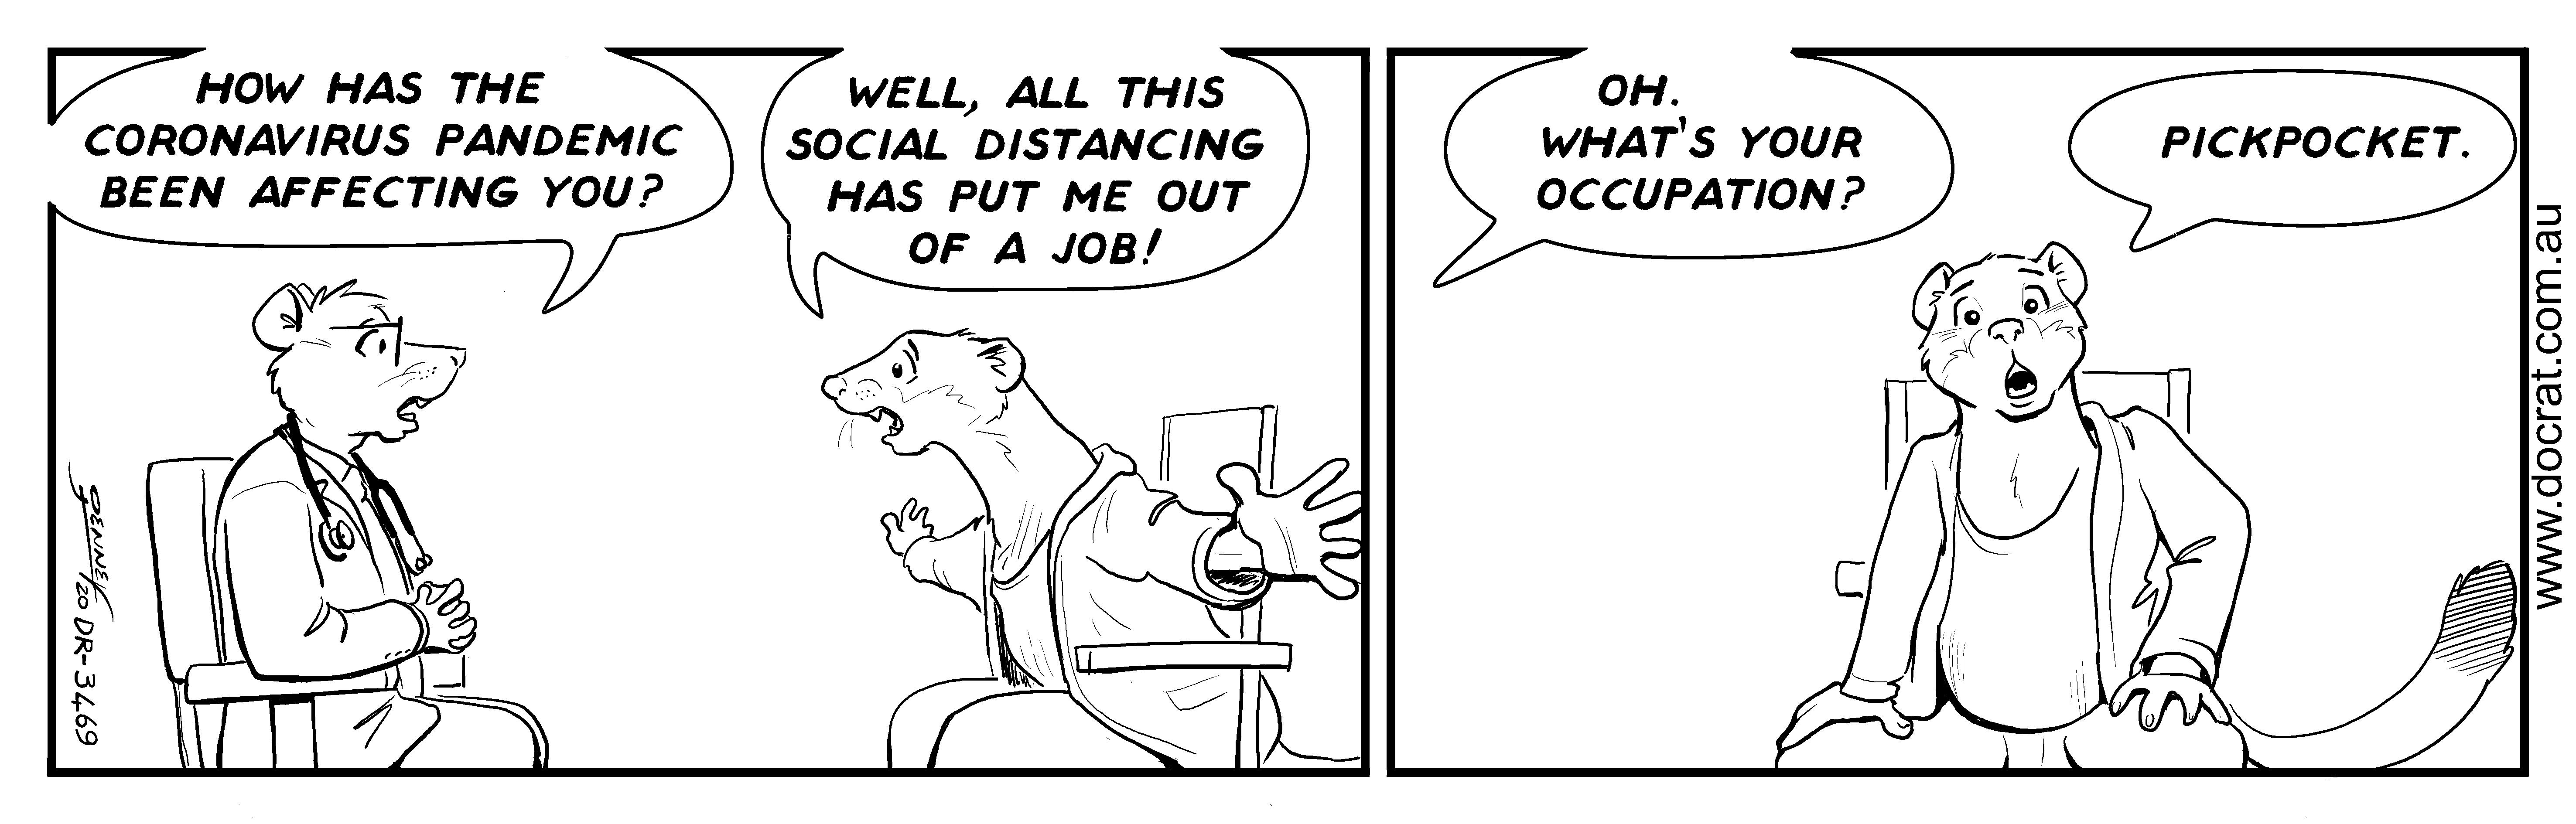 20200430